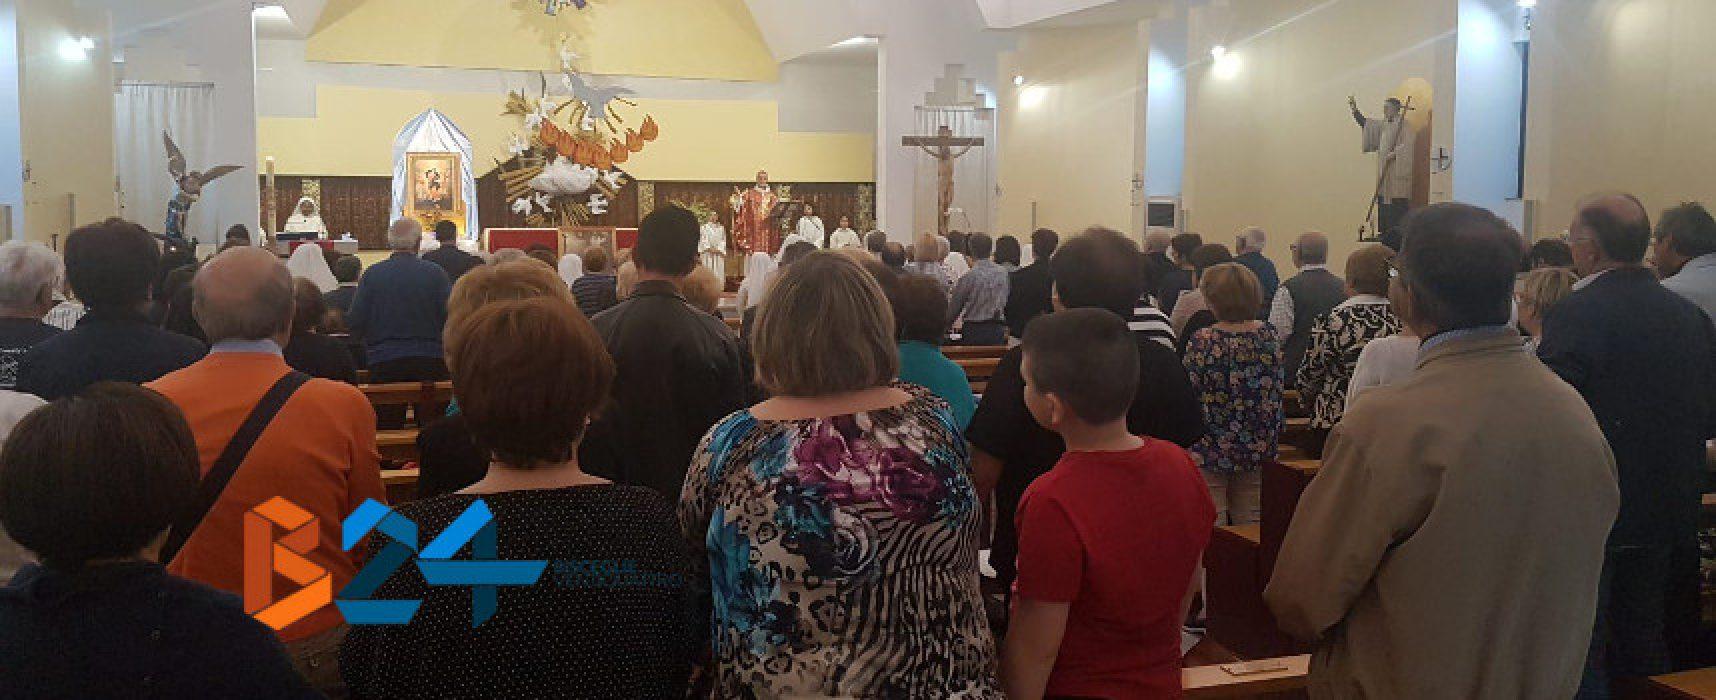 San Vincenzo De Paoli, dopo padre Onofrio va via anche padre Giuseppe? I fedeli si oppongono